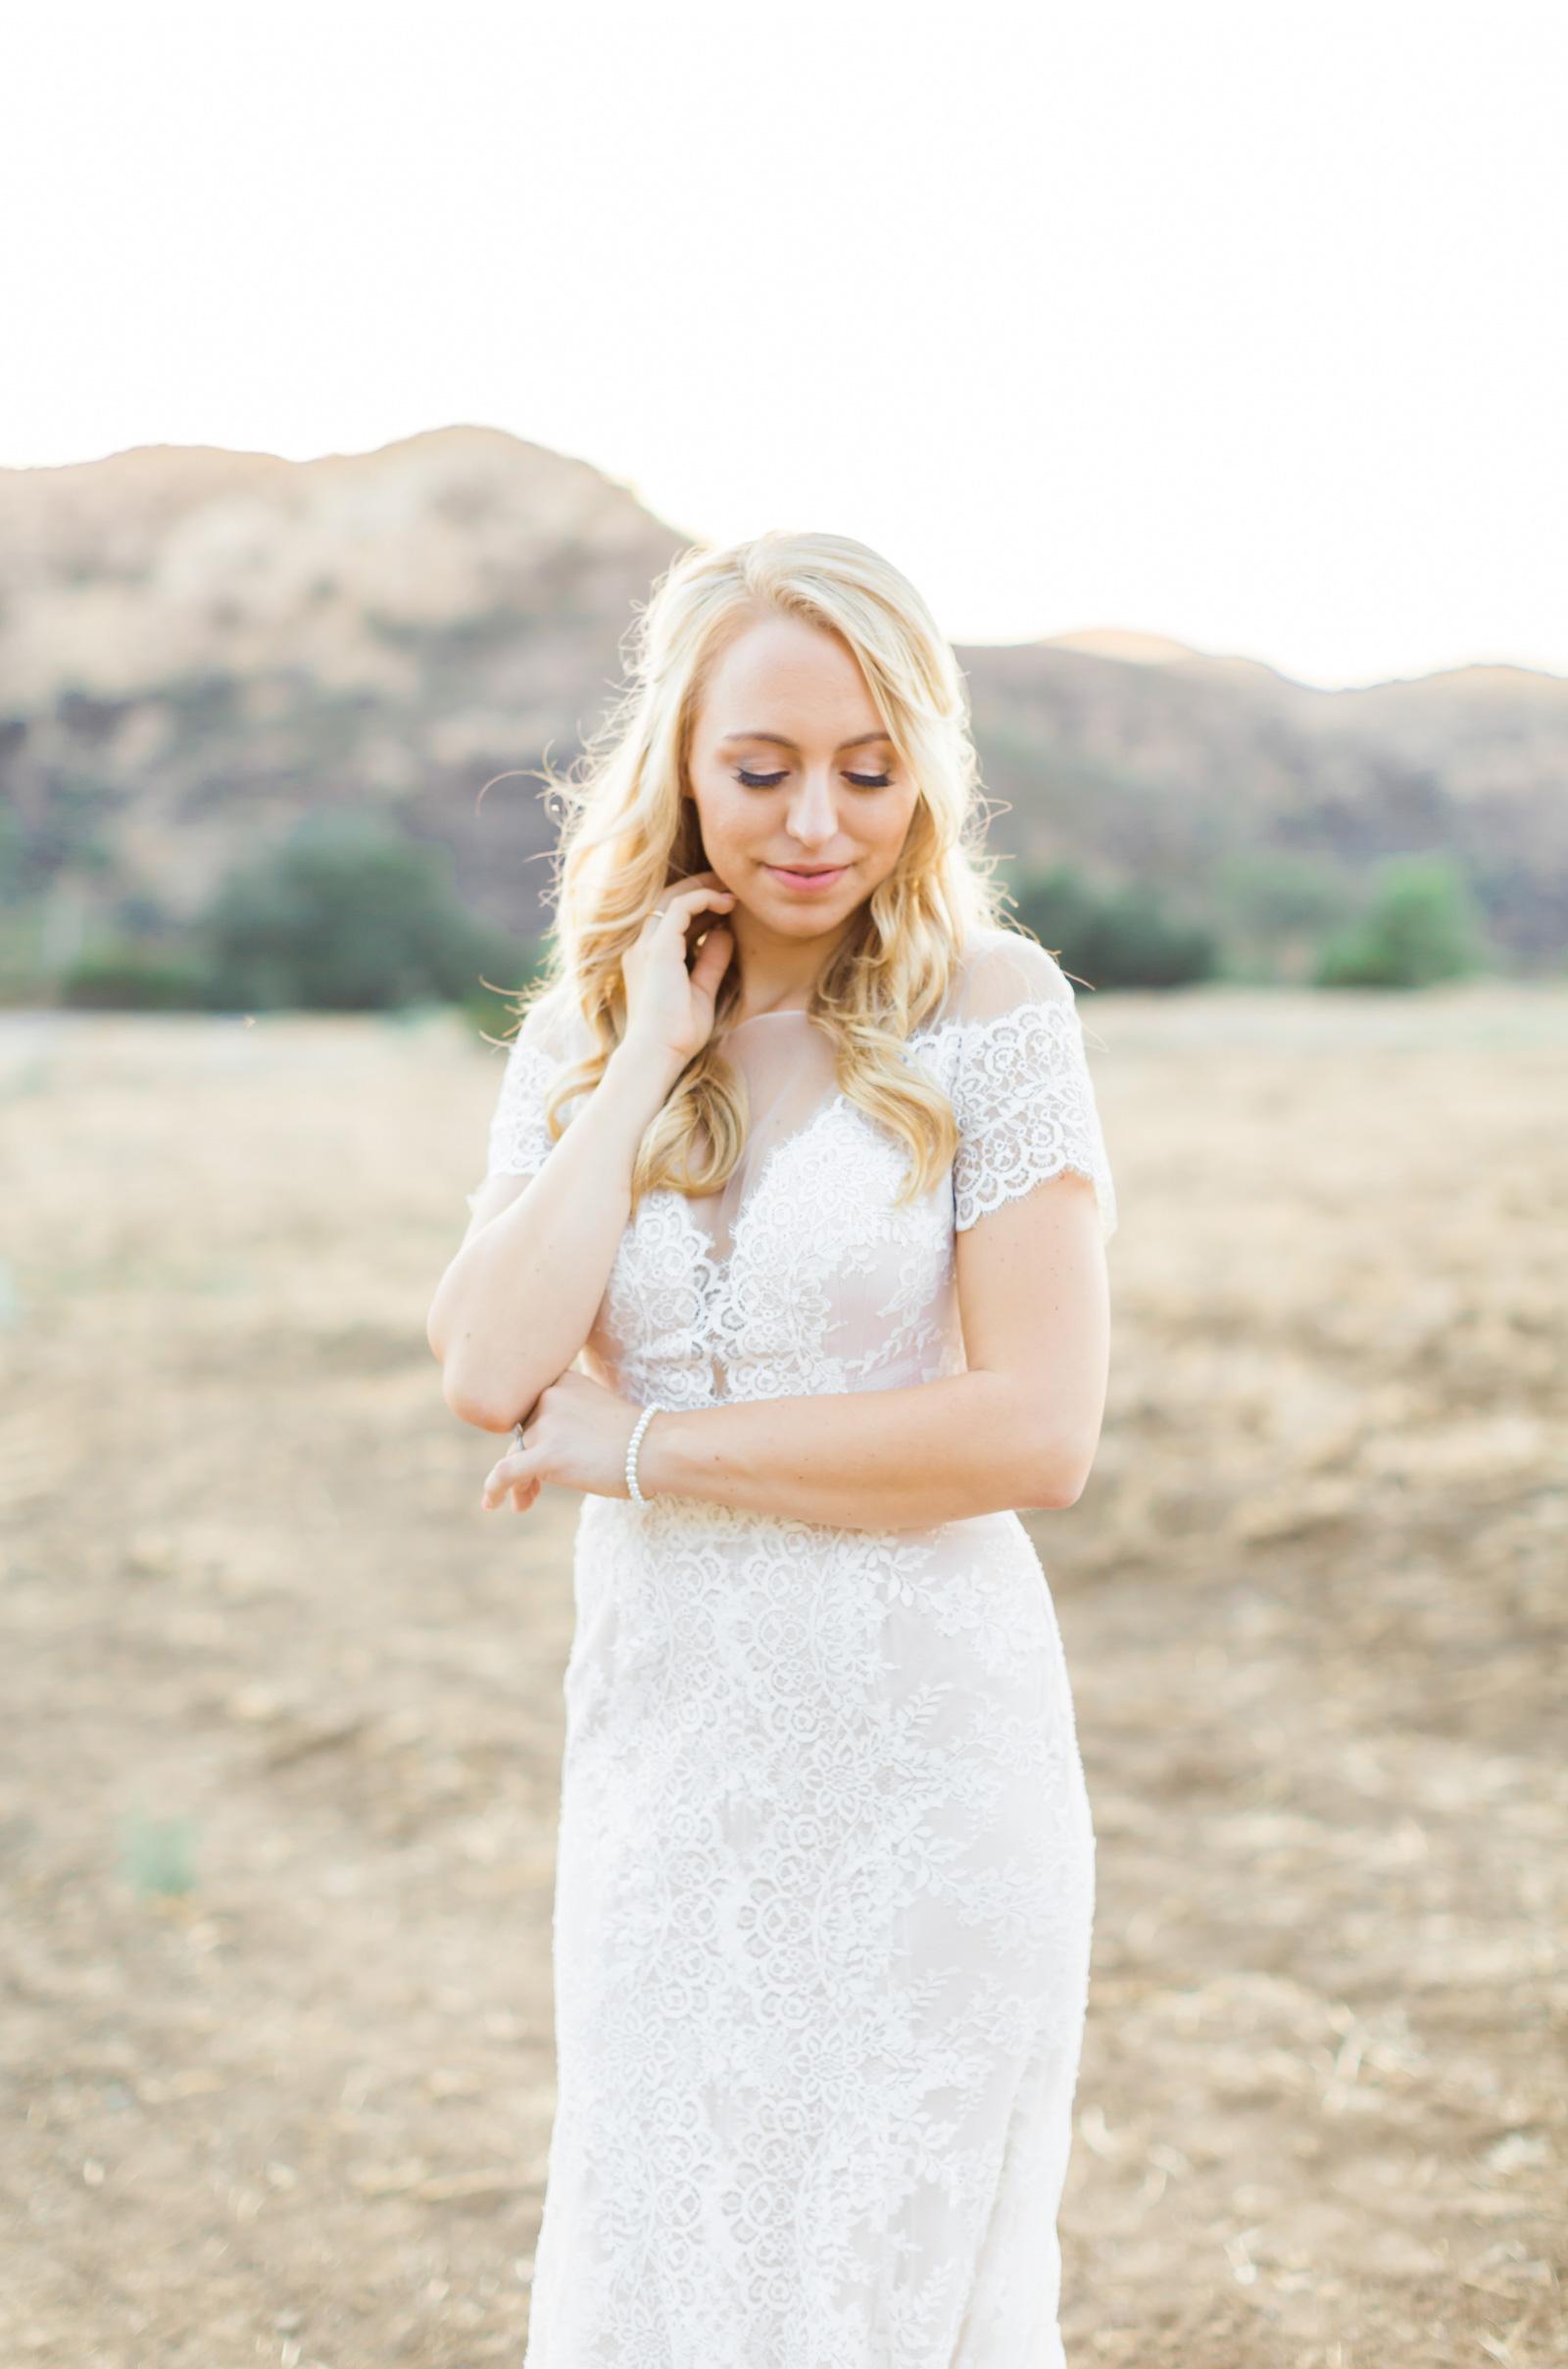 California-Wedding-Photographer-Style-Me-Pretty-Natalie-Schutt-San-Luis-Obispo_07.jpg